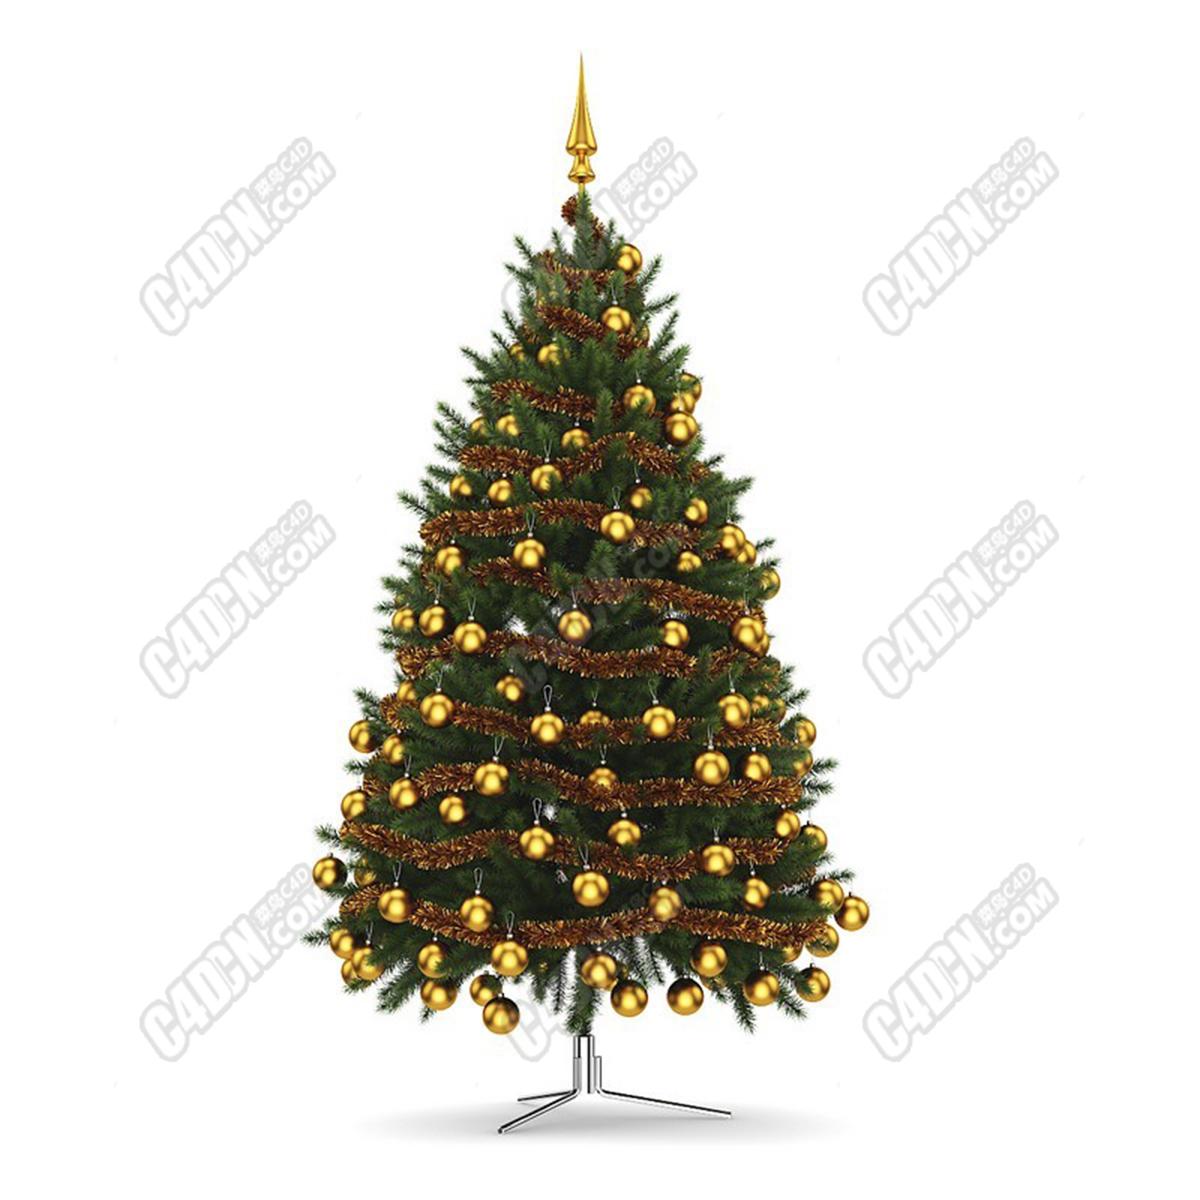 C4D黃金閃亮圣誕樹小球節日裝飾品模型